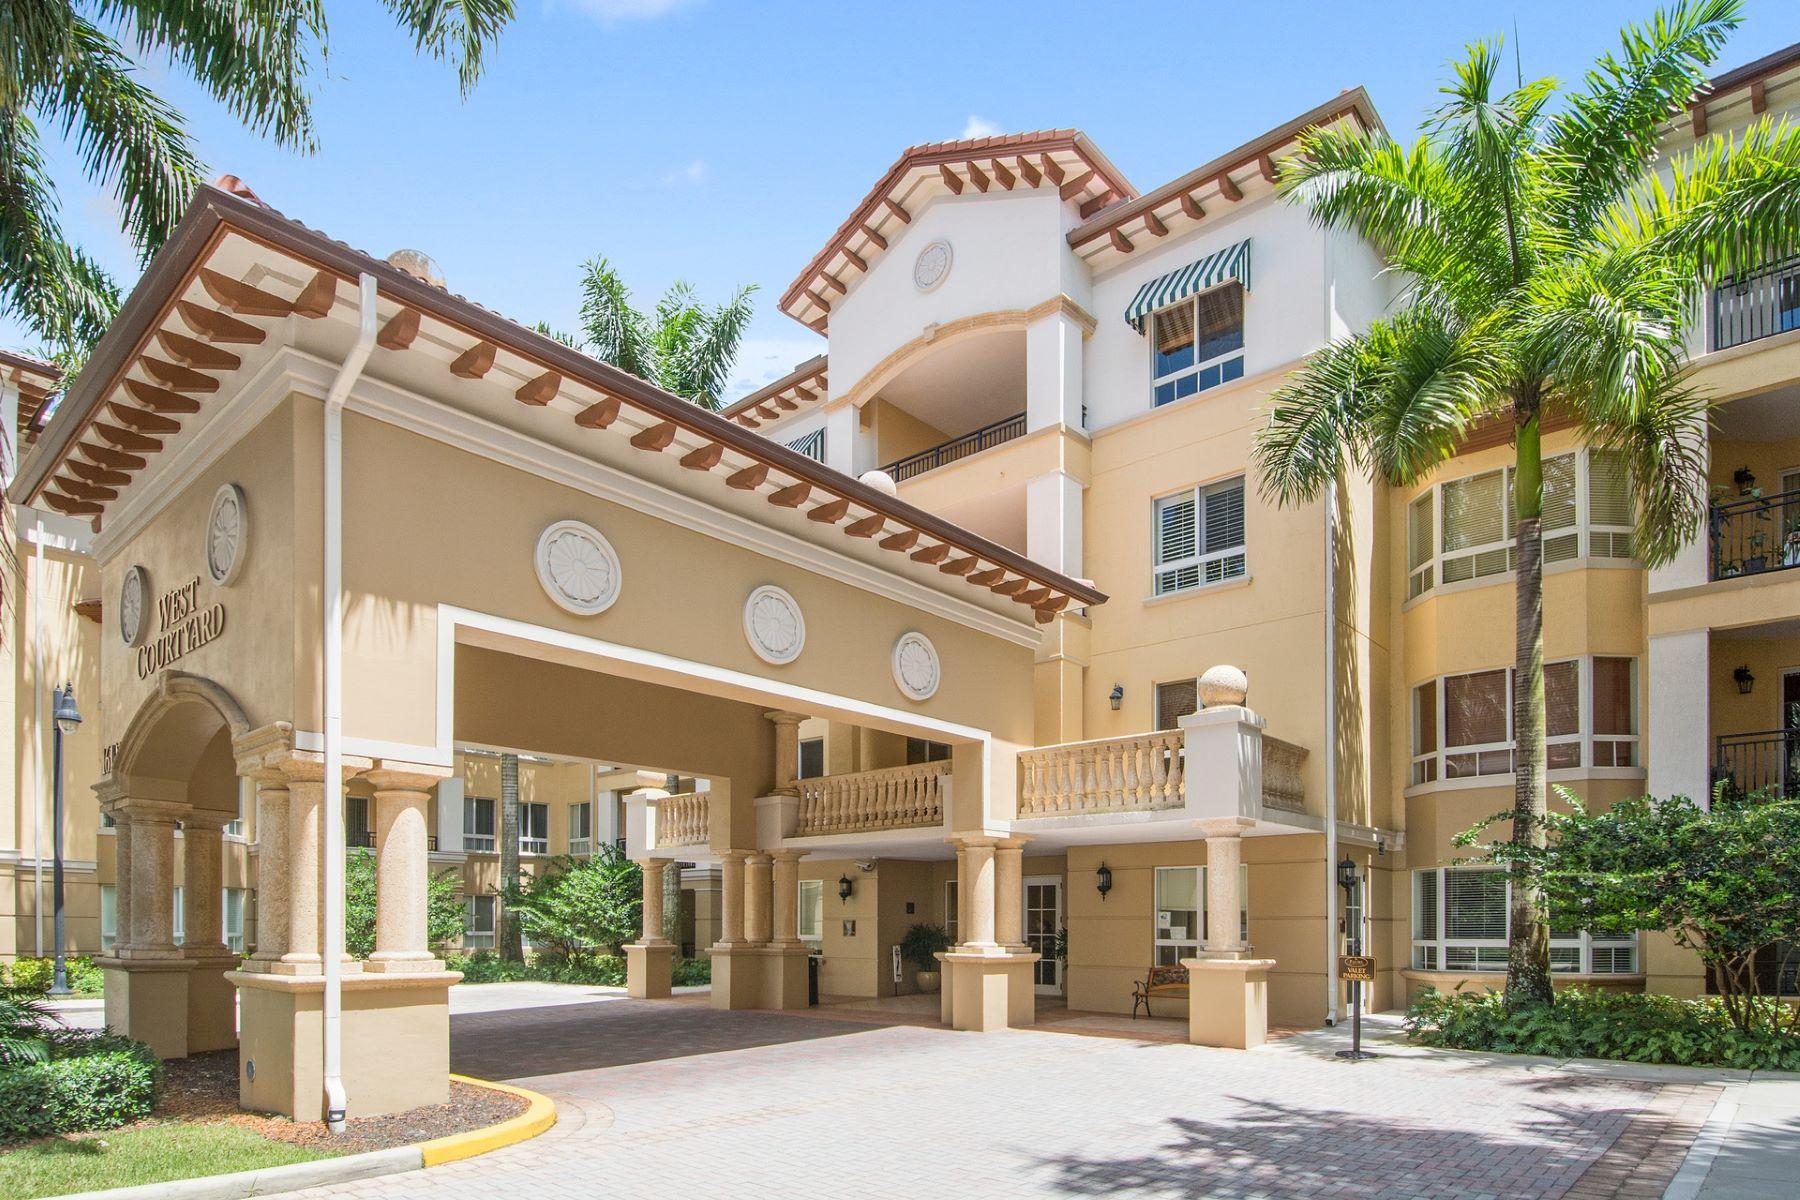 Nhà chung cư vì Bán tại 16101 Emerald Estates Dr. # 445 16101 Emerald Estates Dr # 445 Weston, Florida, 33331 Hoa Kỳ